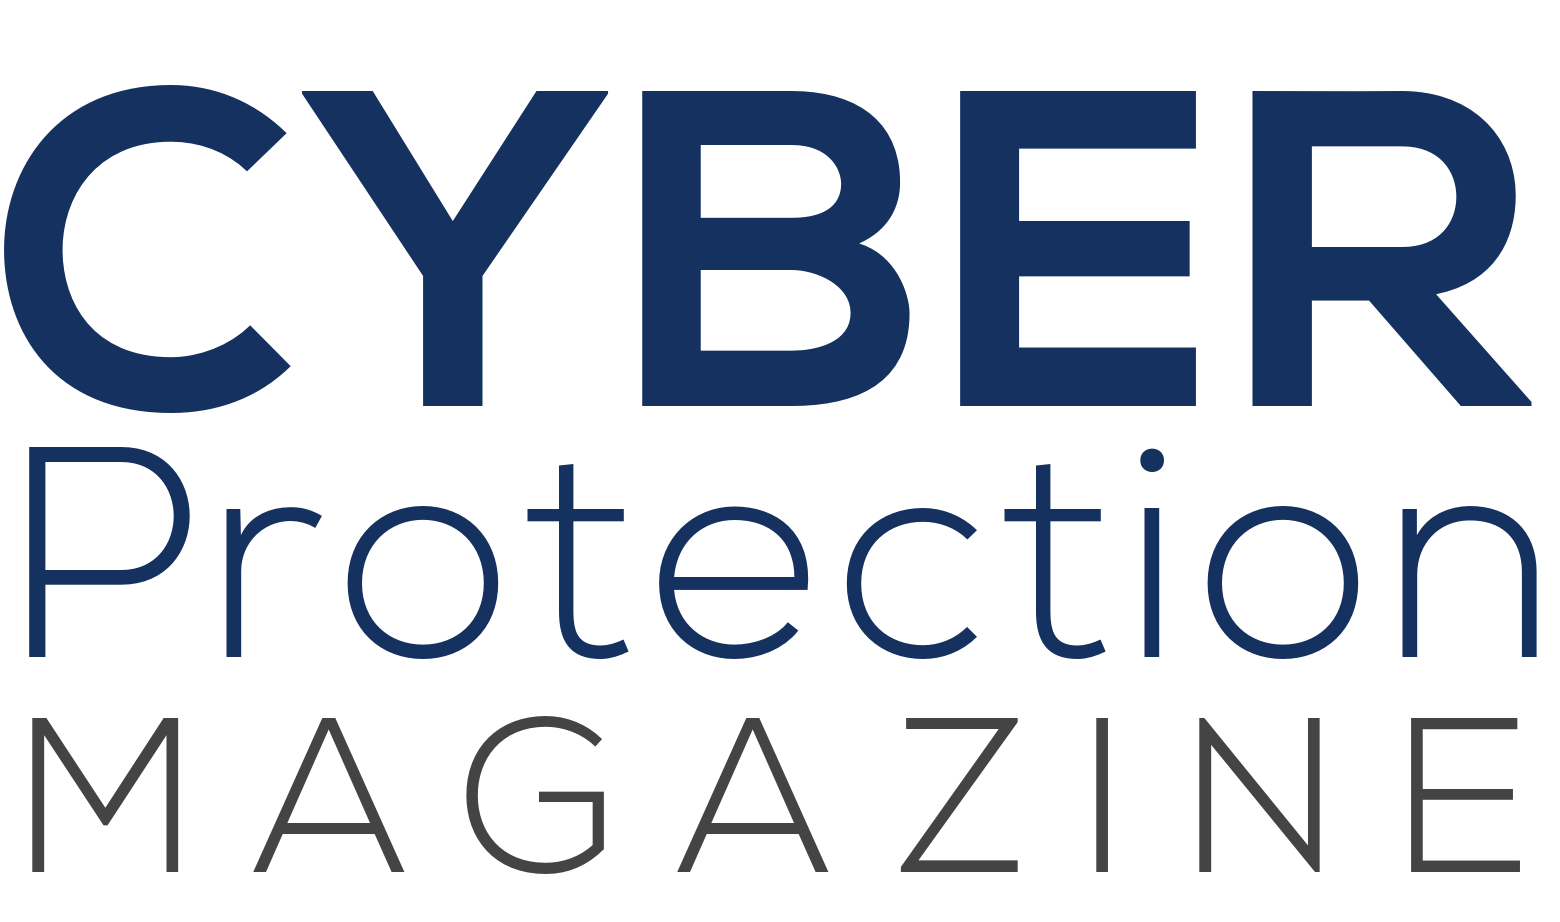 Cybersecurity Magazine